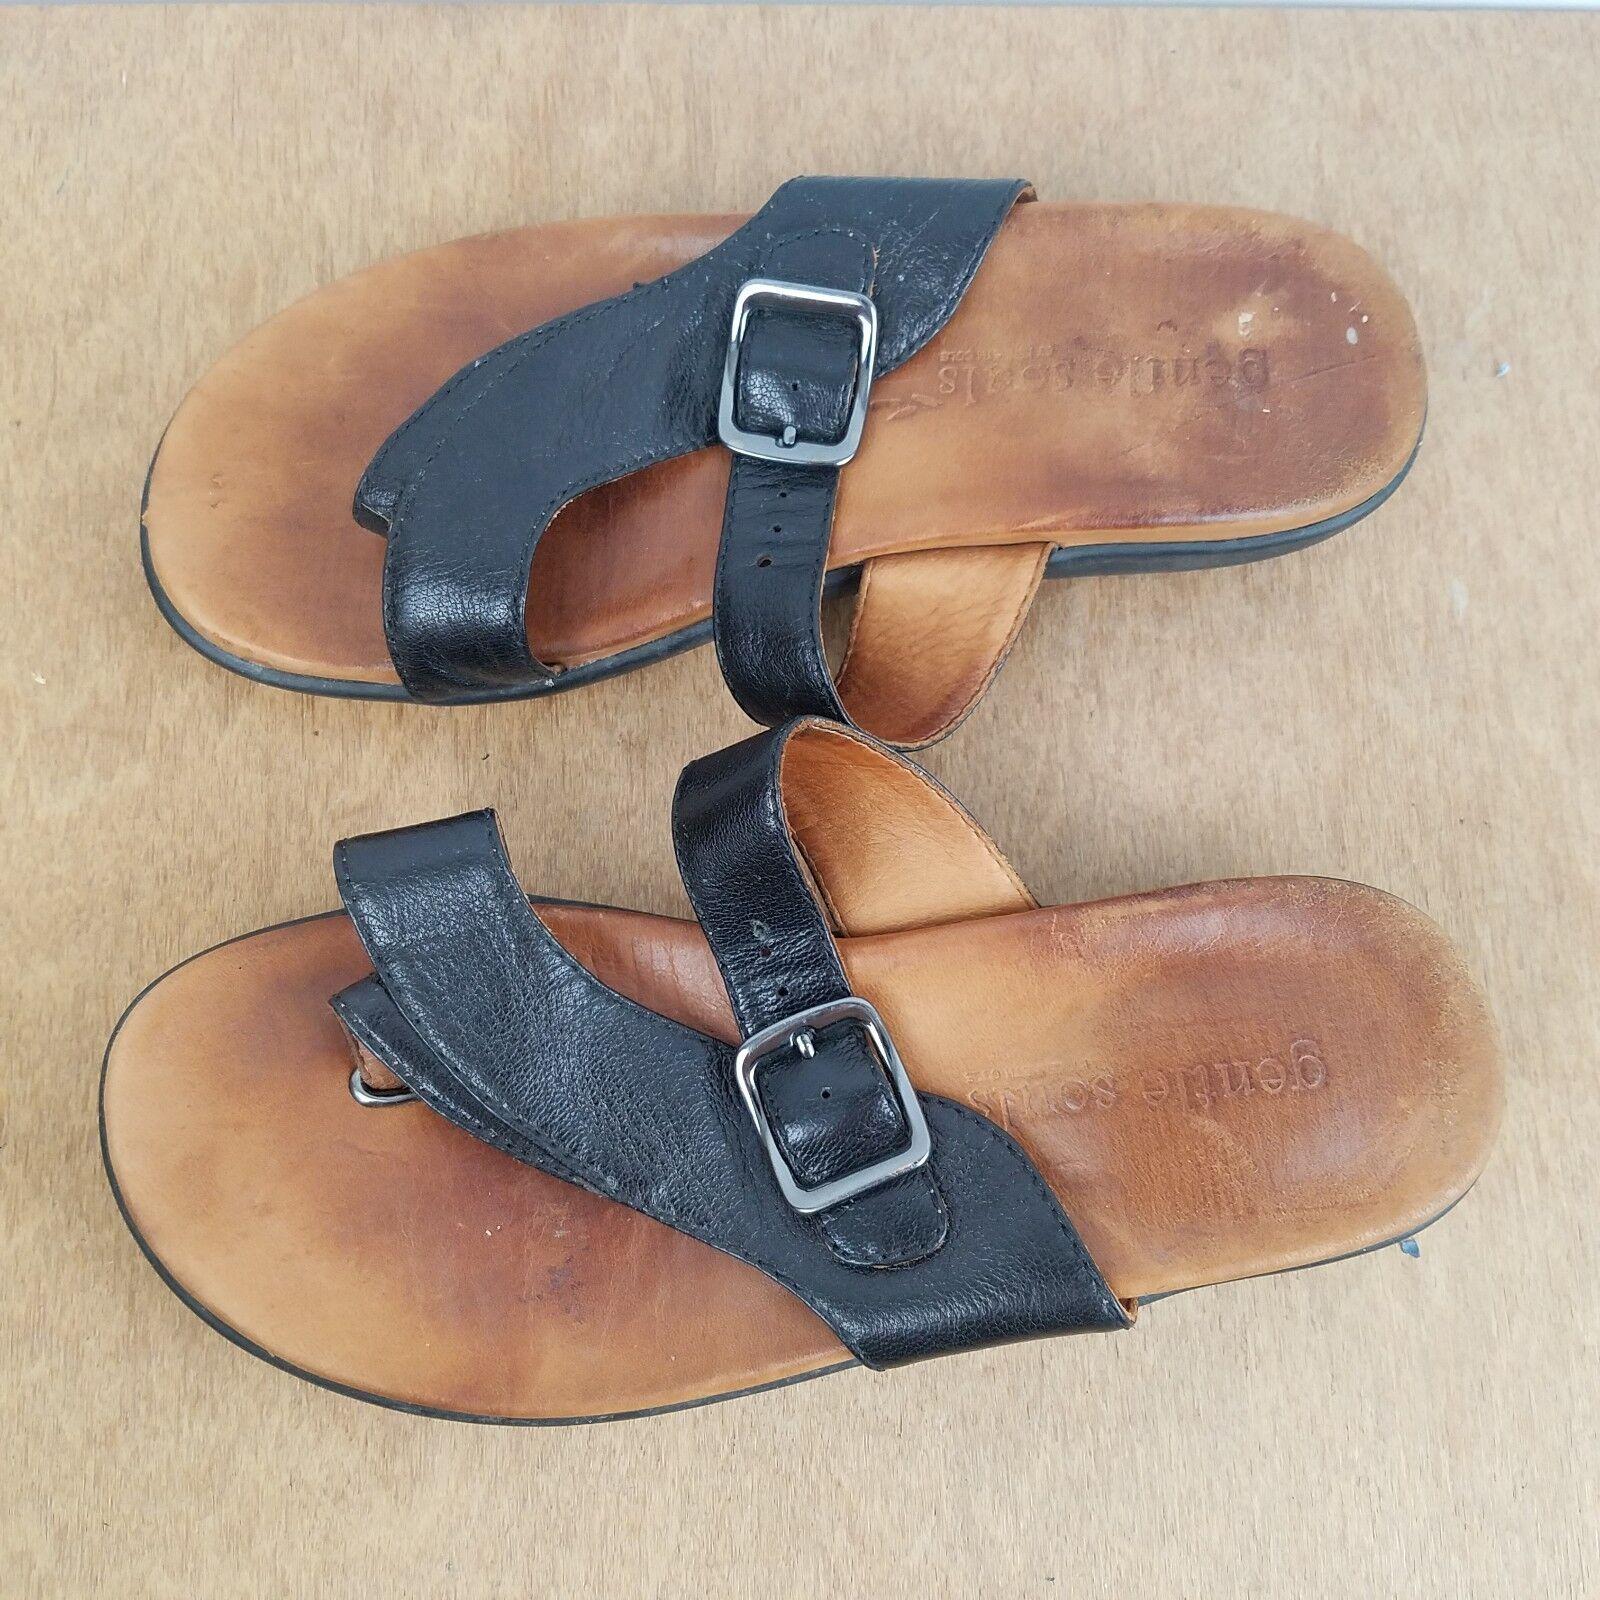 Gentle Souls seagol nos para Mujer 7 Cuero Sandalia Zapatos Negro Slip On Tanga